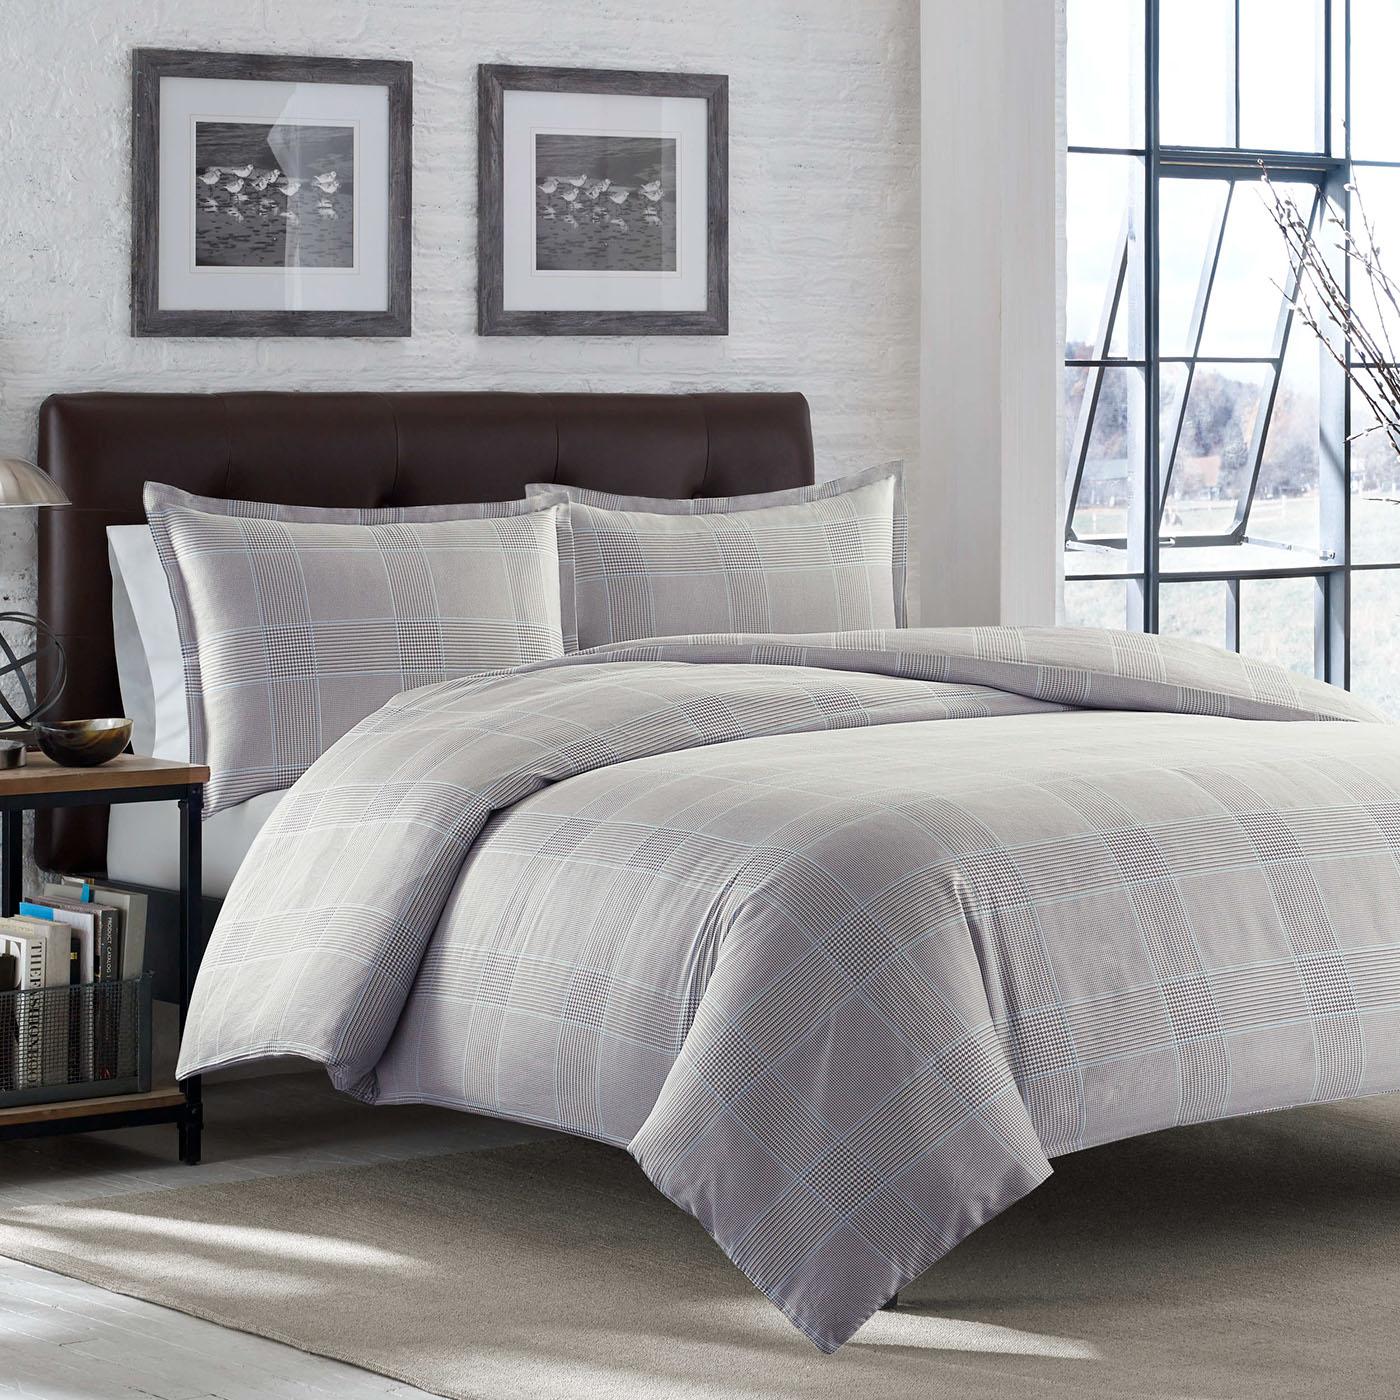 fabulous for crib baby bed with rib bedding bauer metal sets eddie big organic mattress